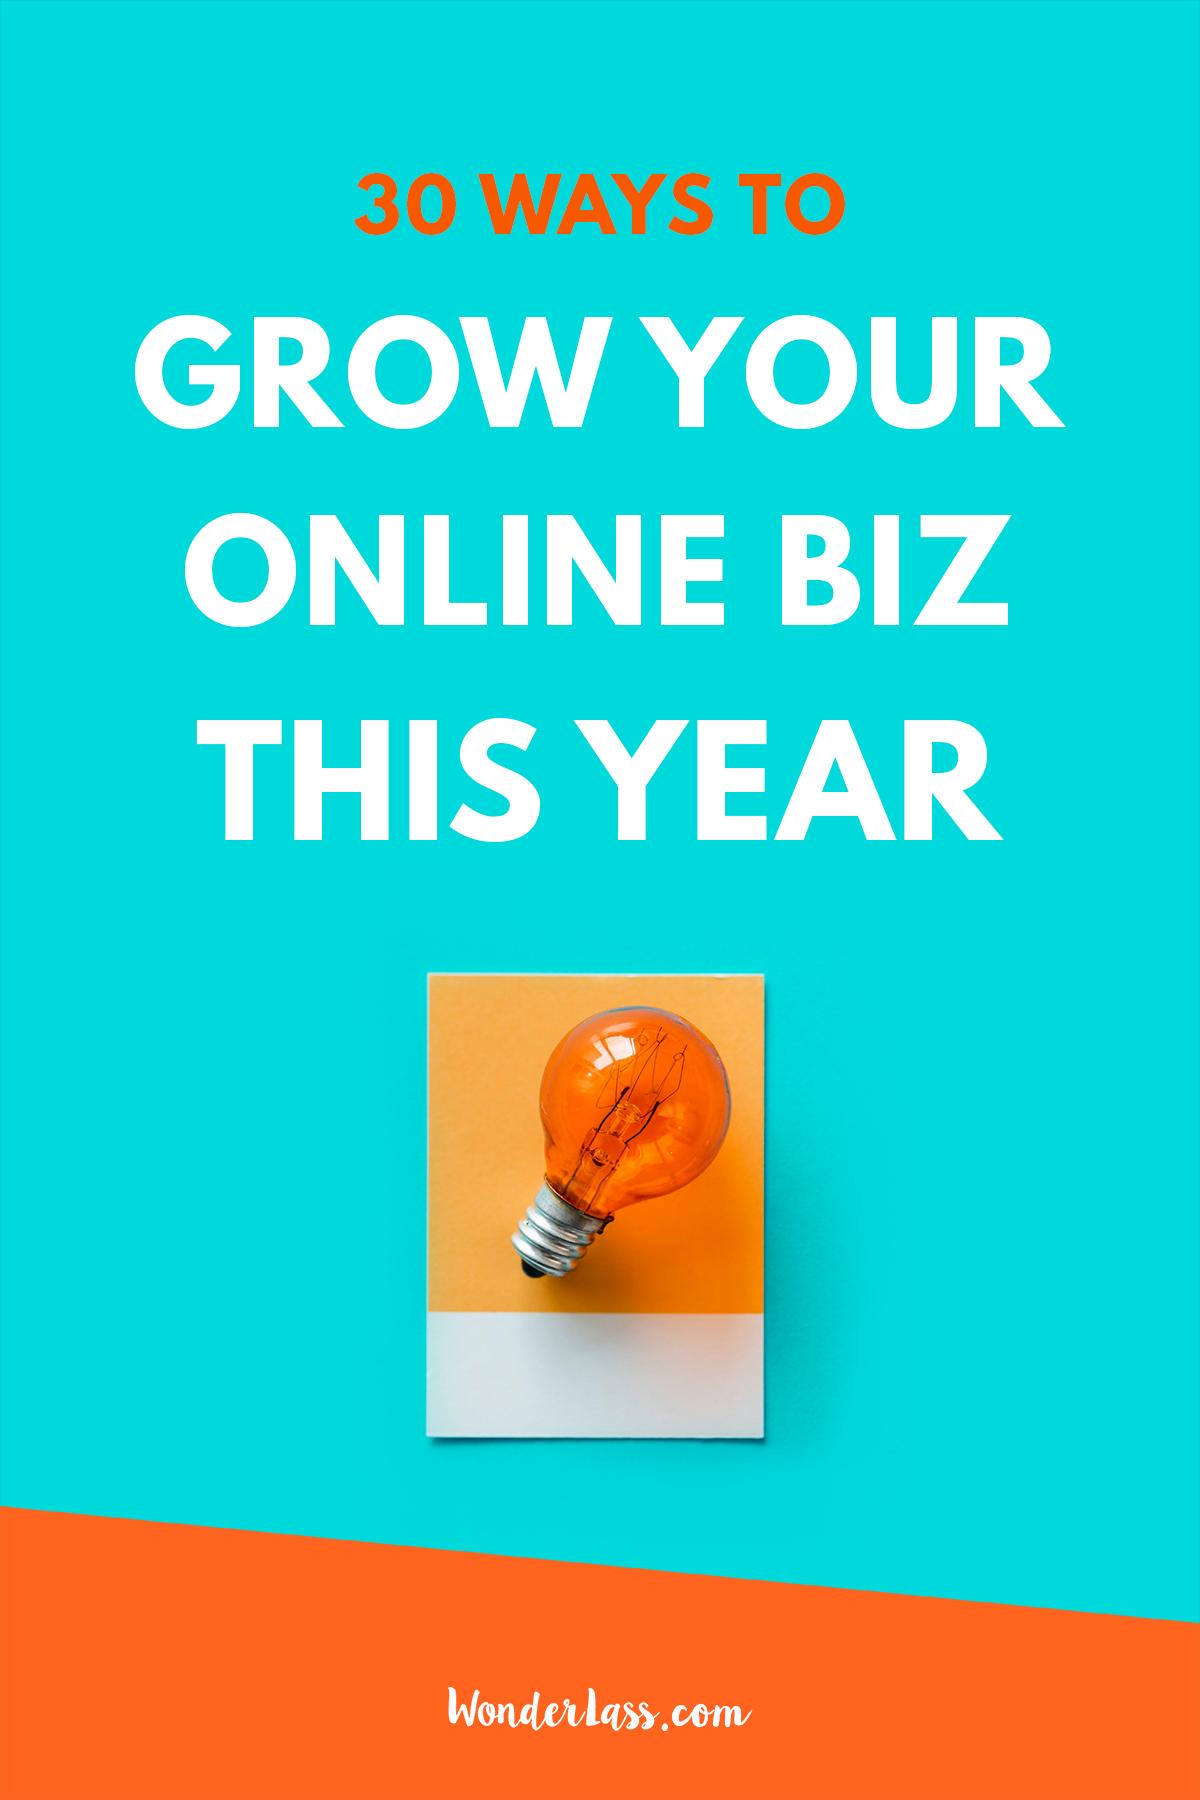 30 Ways to Grow Your Online Business This Year | Wonderlass  #onlinebusiness #makepassiveincome #onlinemarketing